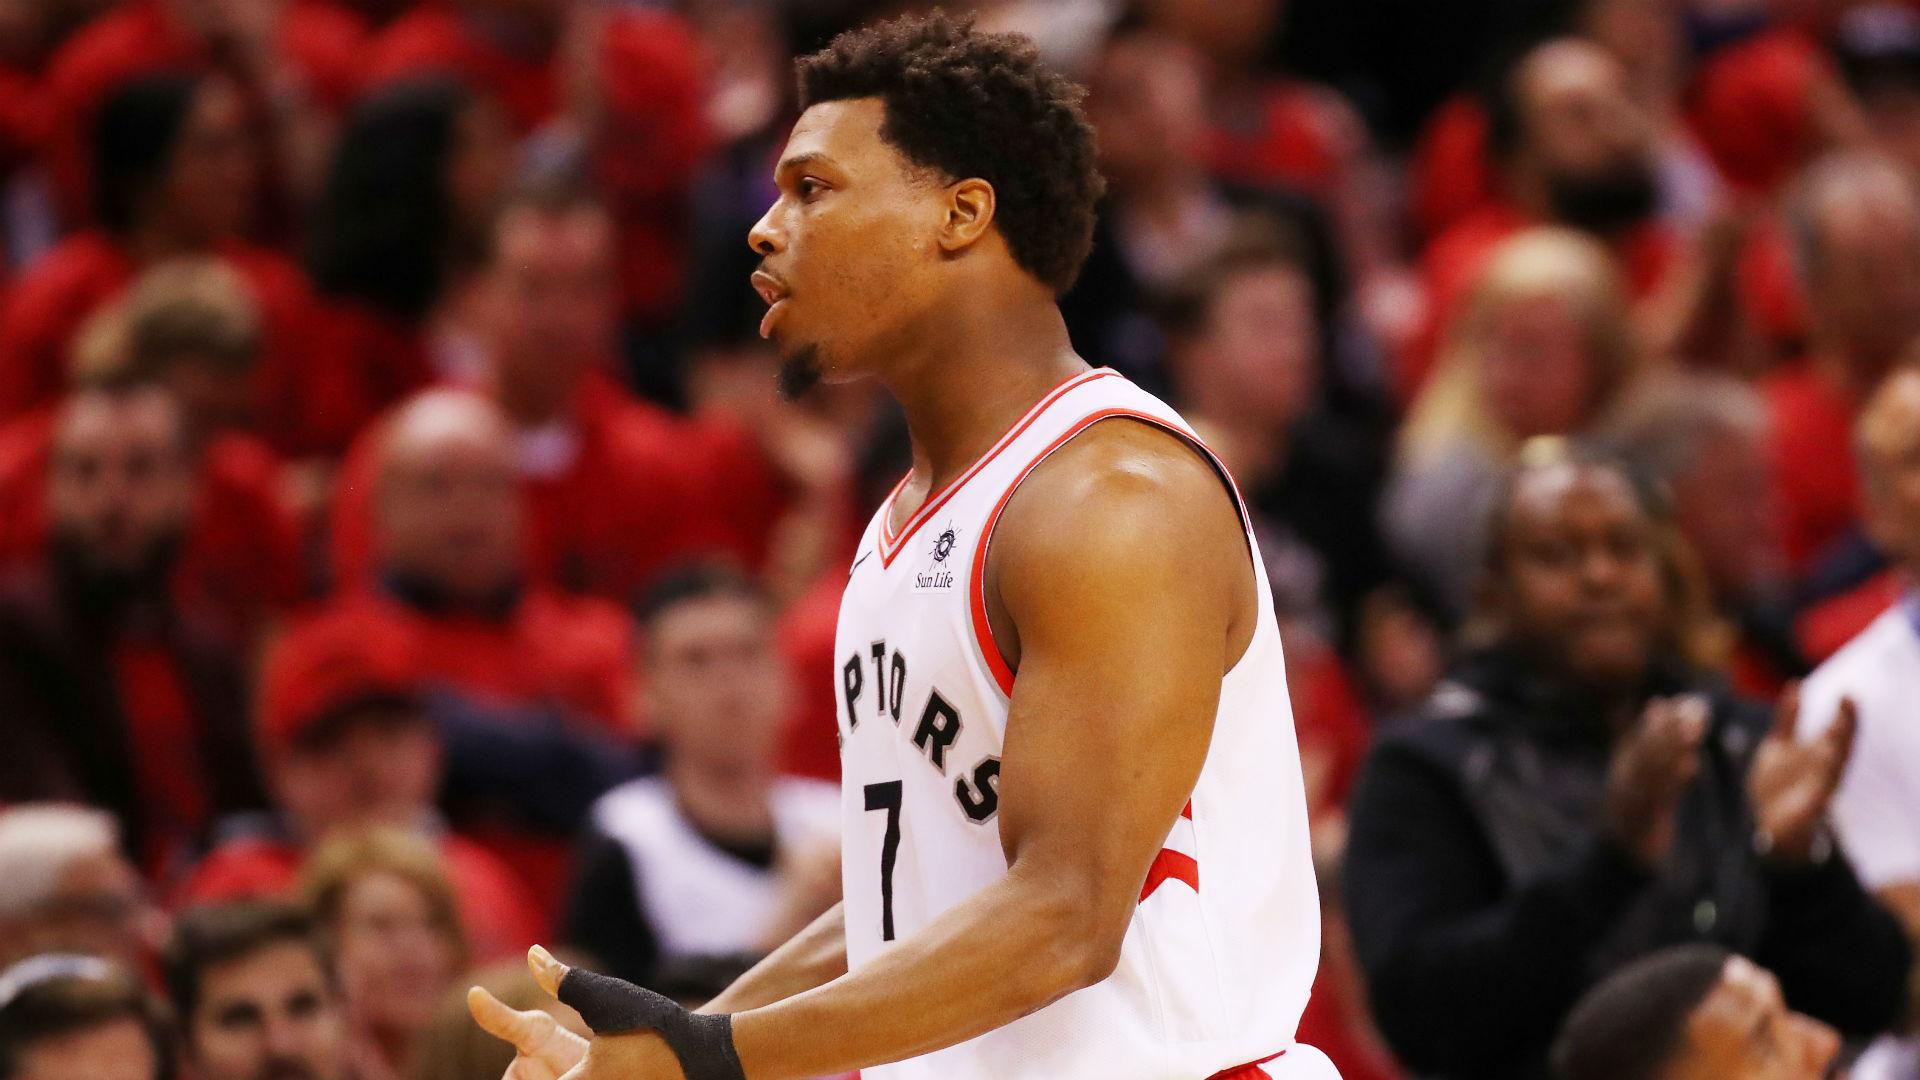 Report: Toronto Raptors guard Kyle Lowry undergoes procedure on left thumb, eyes USA Basketball training camp return